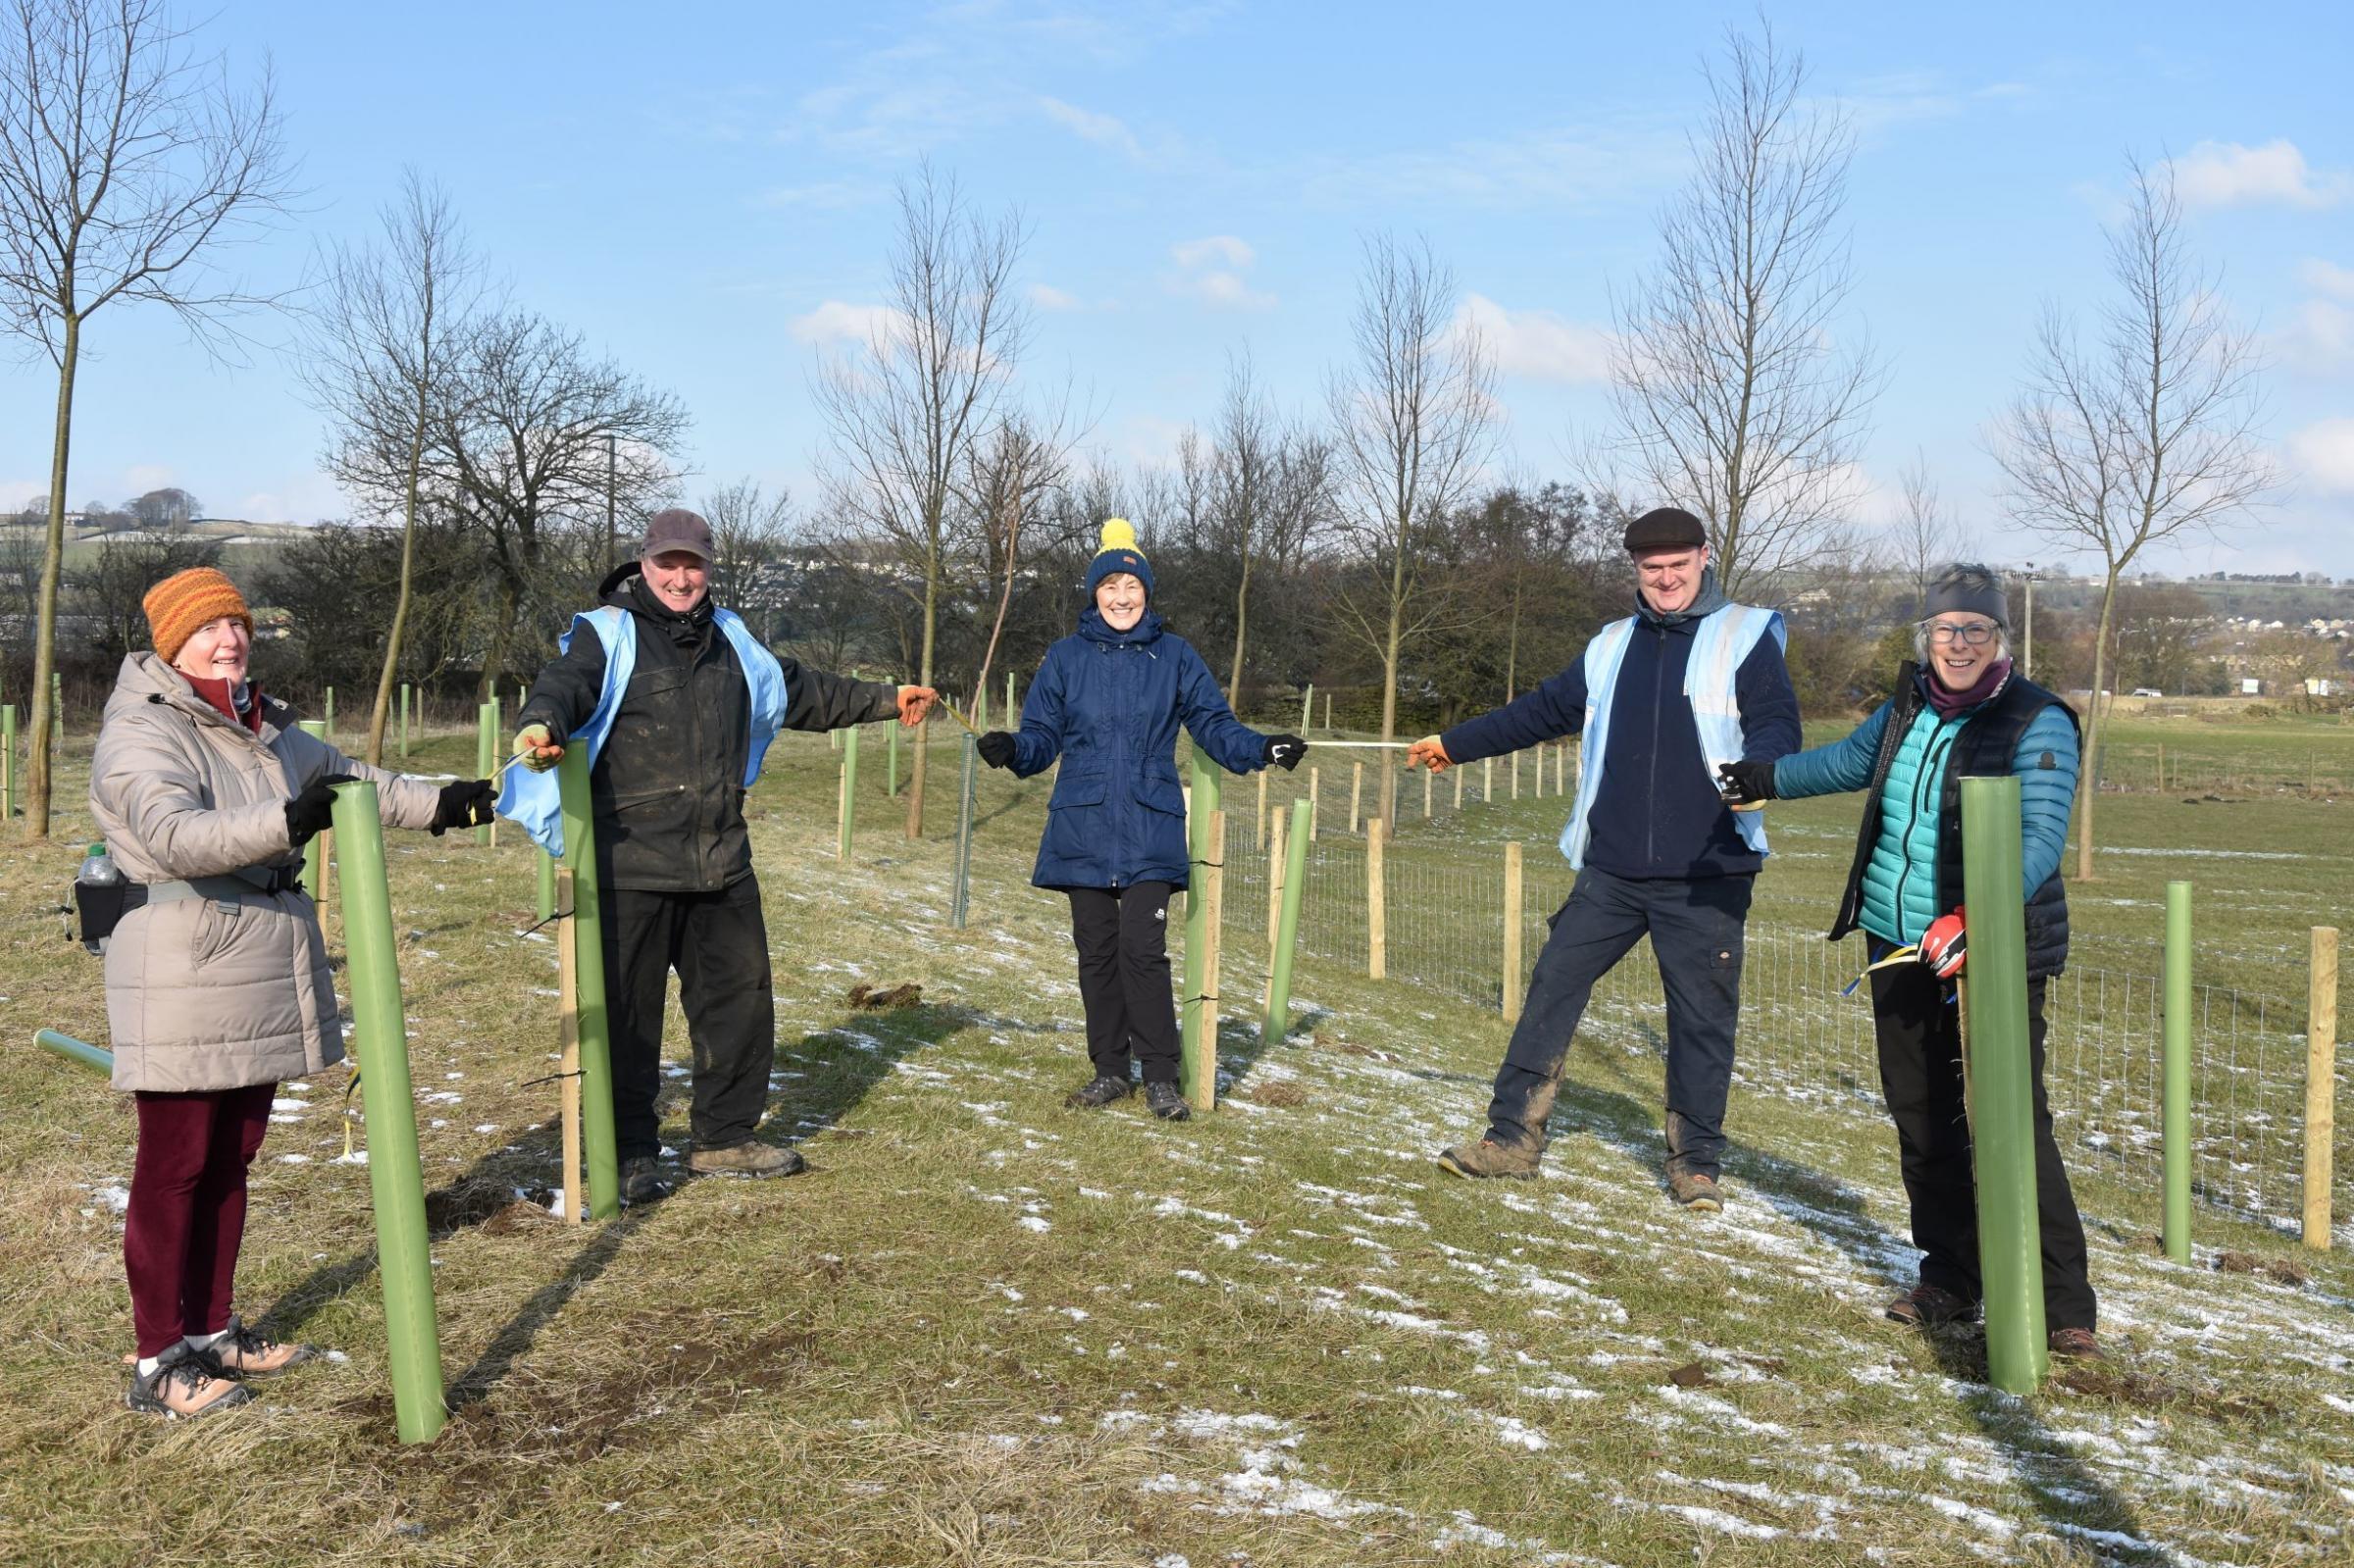 Soroptimists plant trees in centenary year